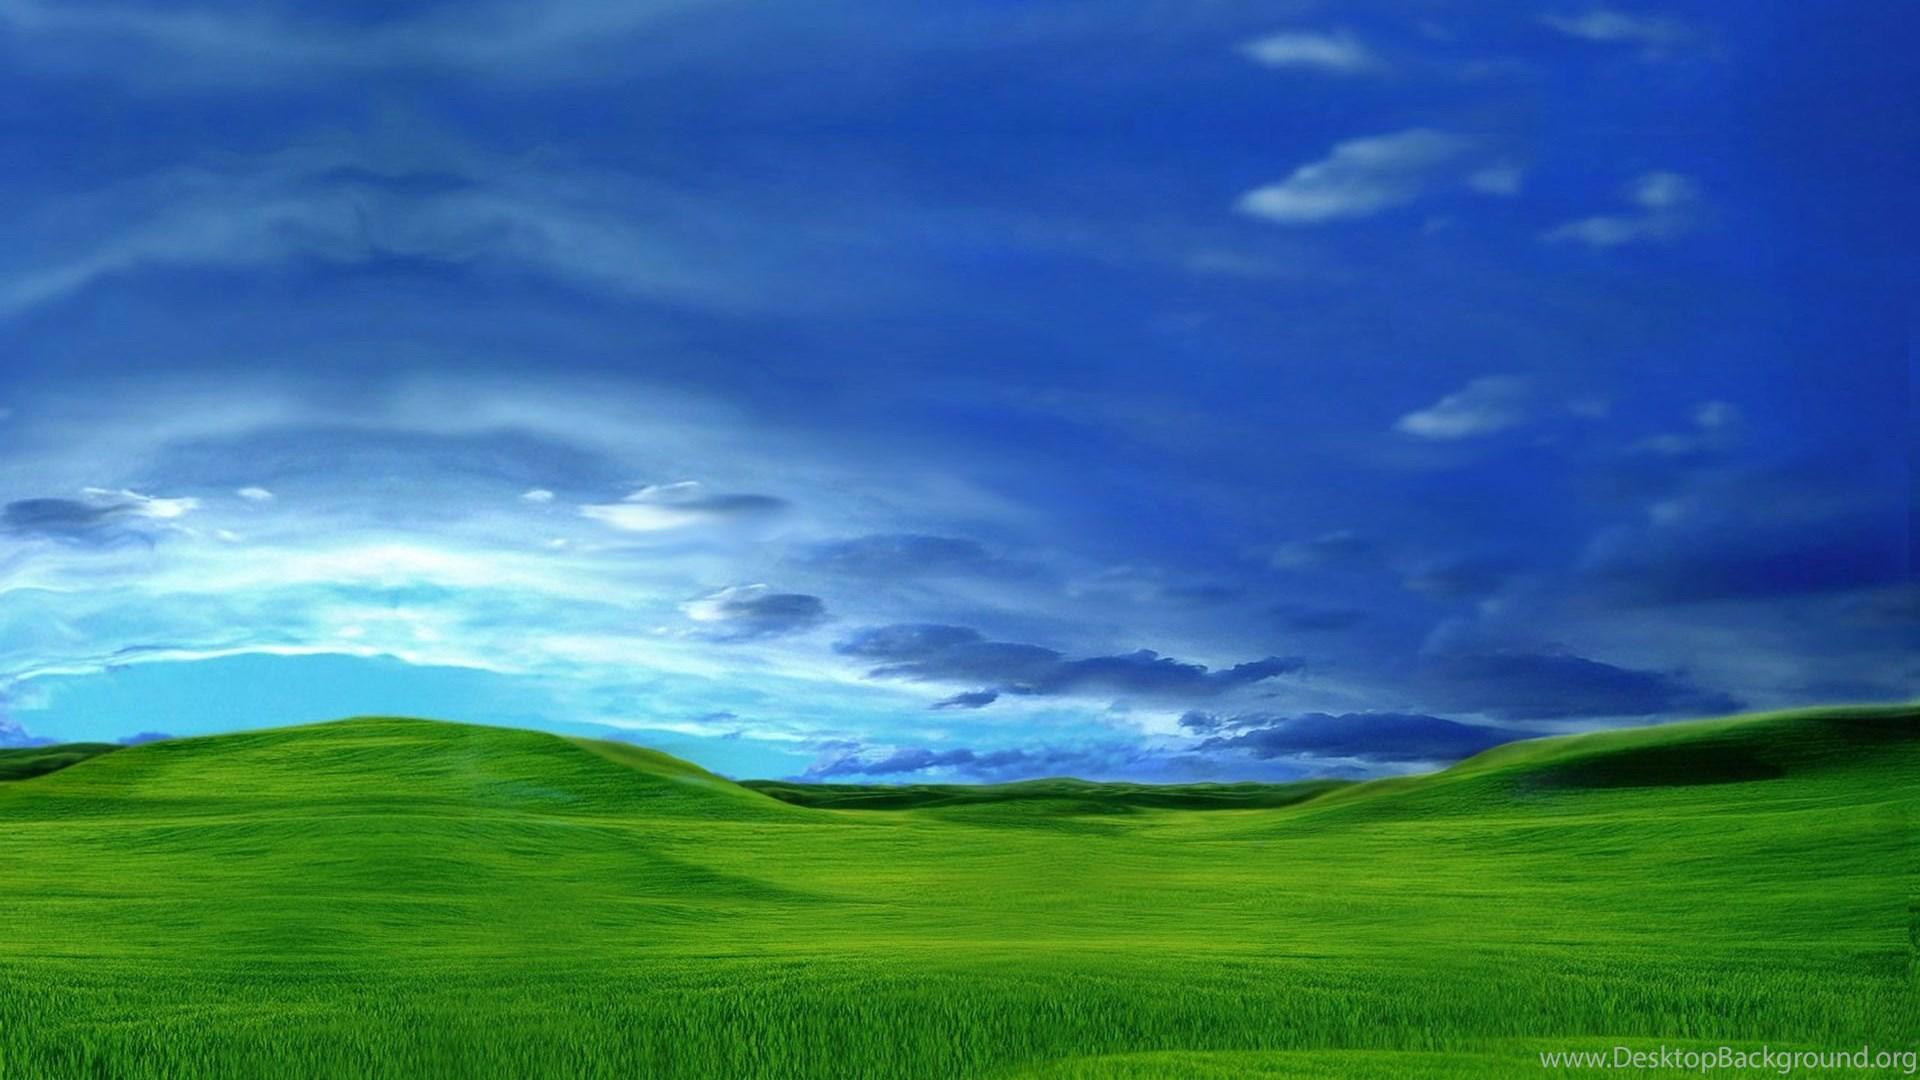 Windows Xp Backgrounds Wallpapers Cave Desktop Background